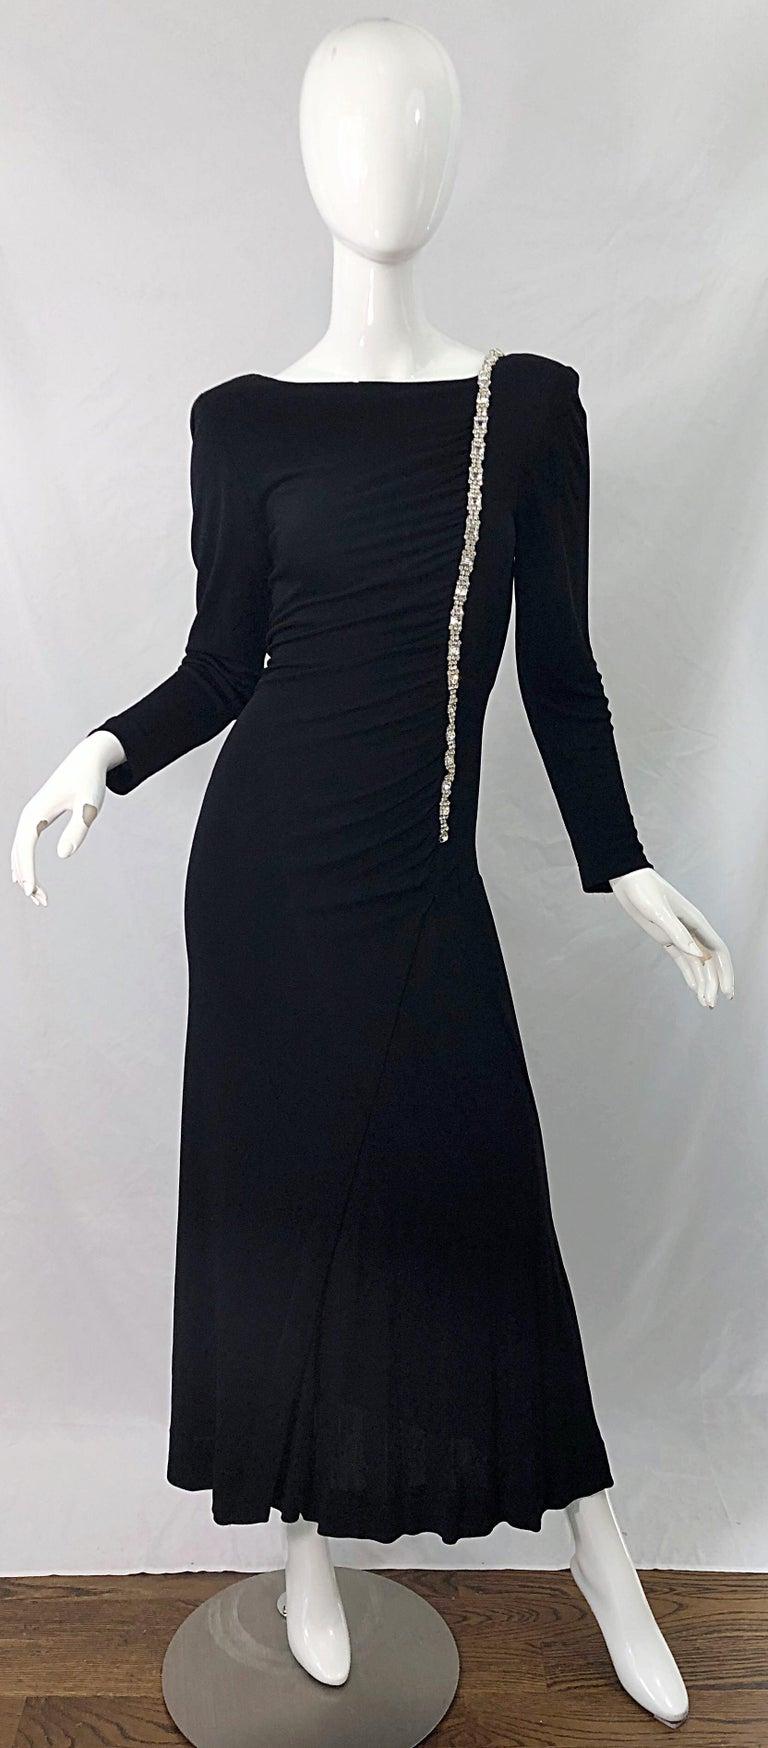 1980s Travilla Size 10 Black Matte Silk Jersey Rhinestone Vintage 80s Gown Dress For Sale 10